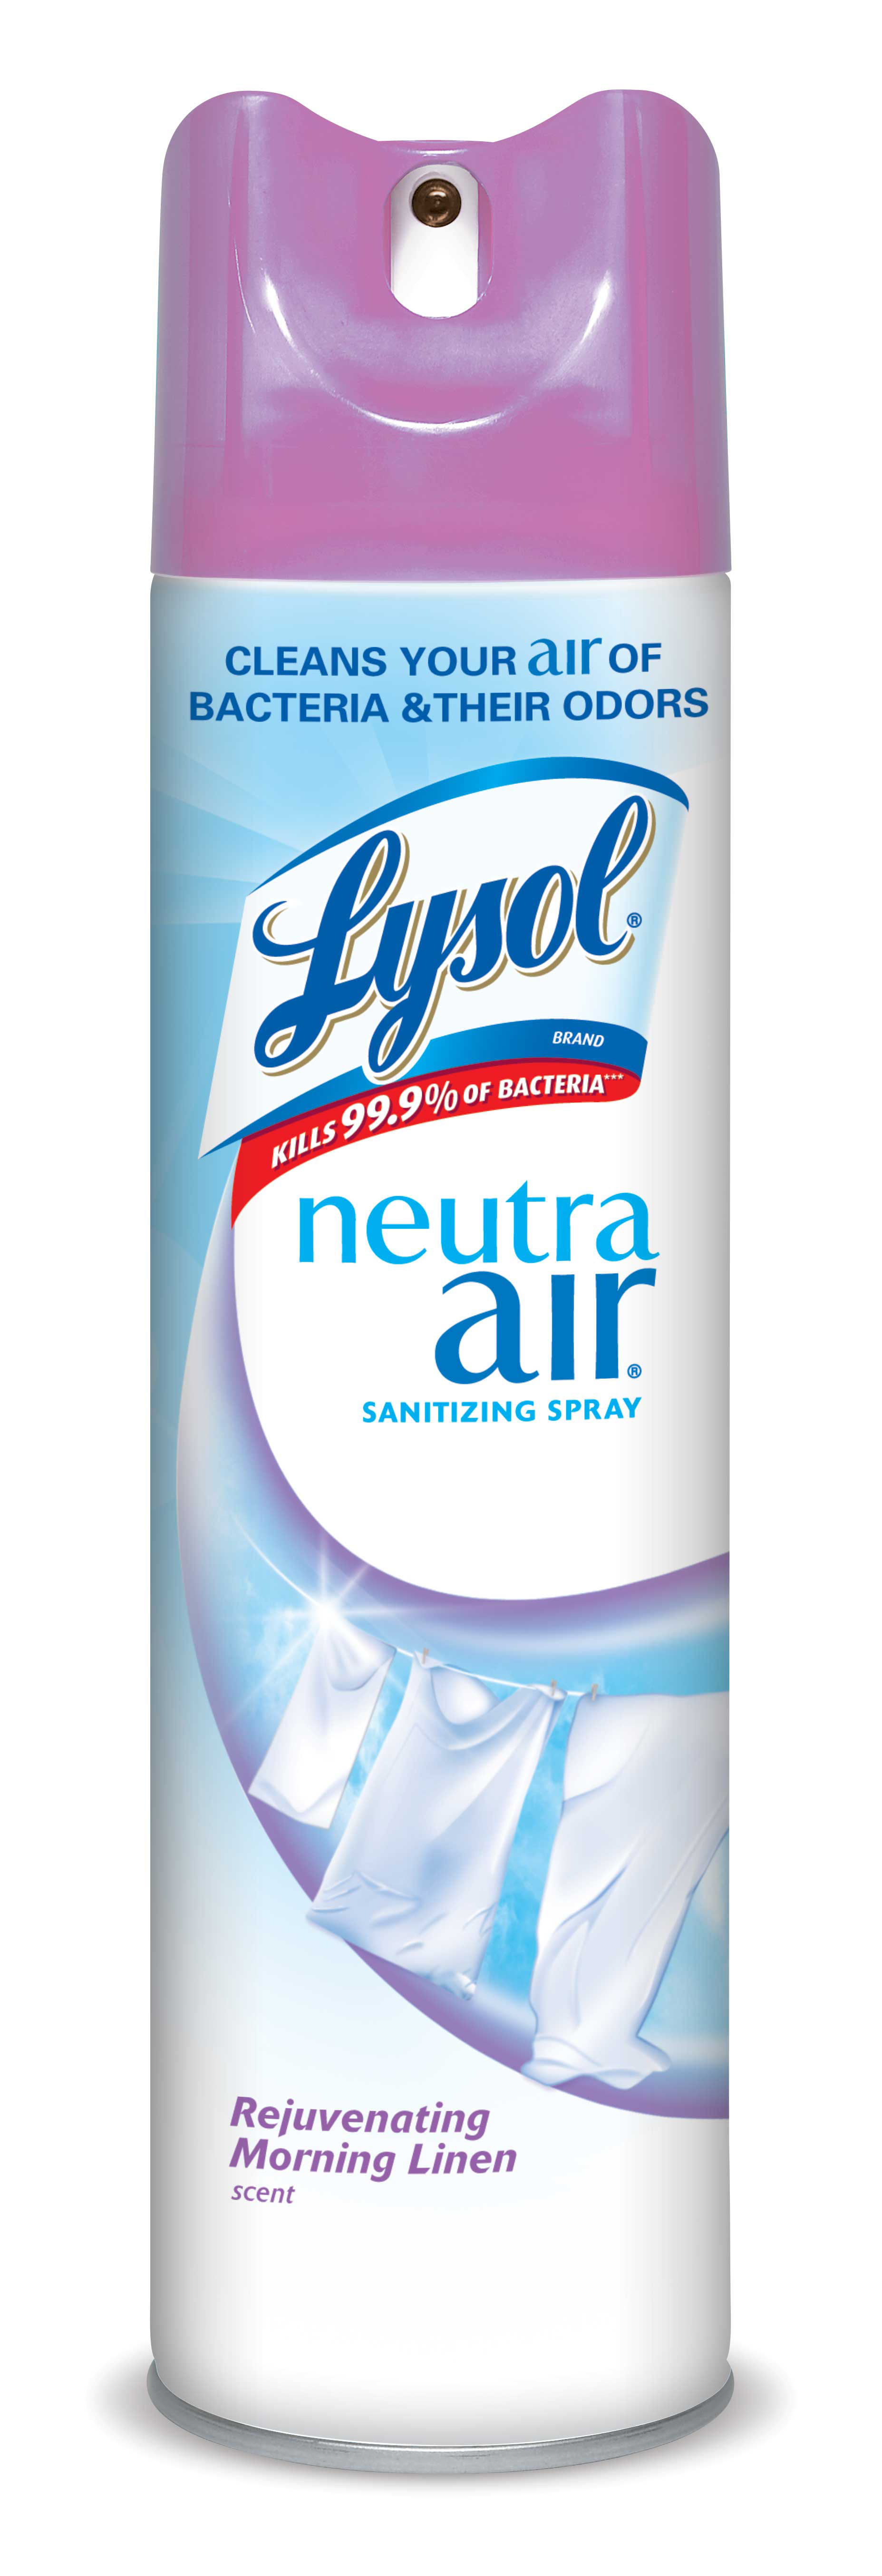 Lysol Neutra Air Sanitizing Spray, Morning Linen, 10oz, Air Freshener, Odor Neutralizer